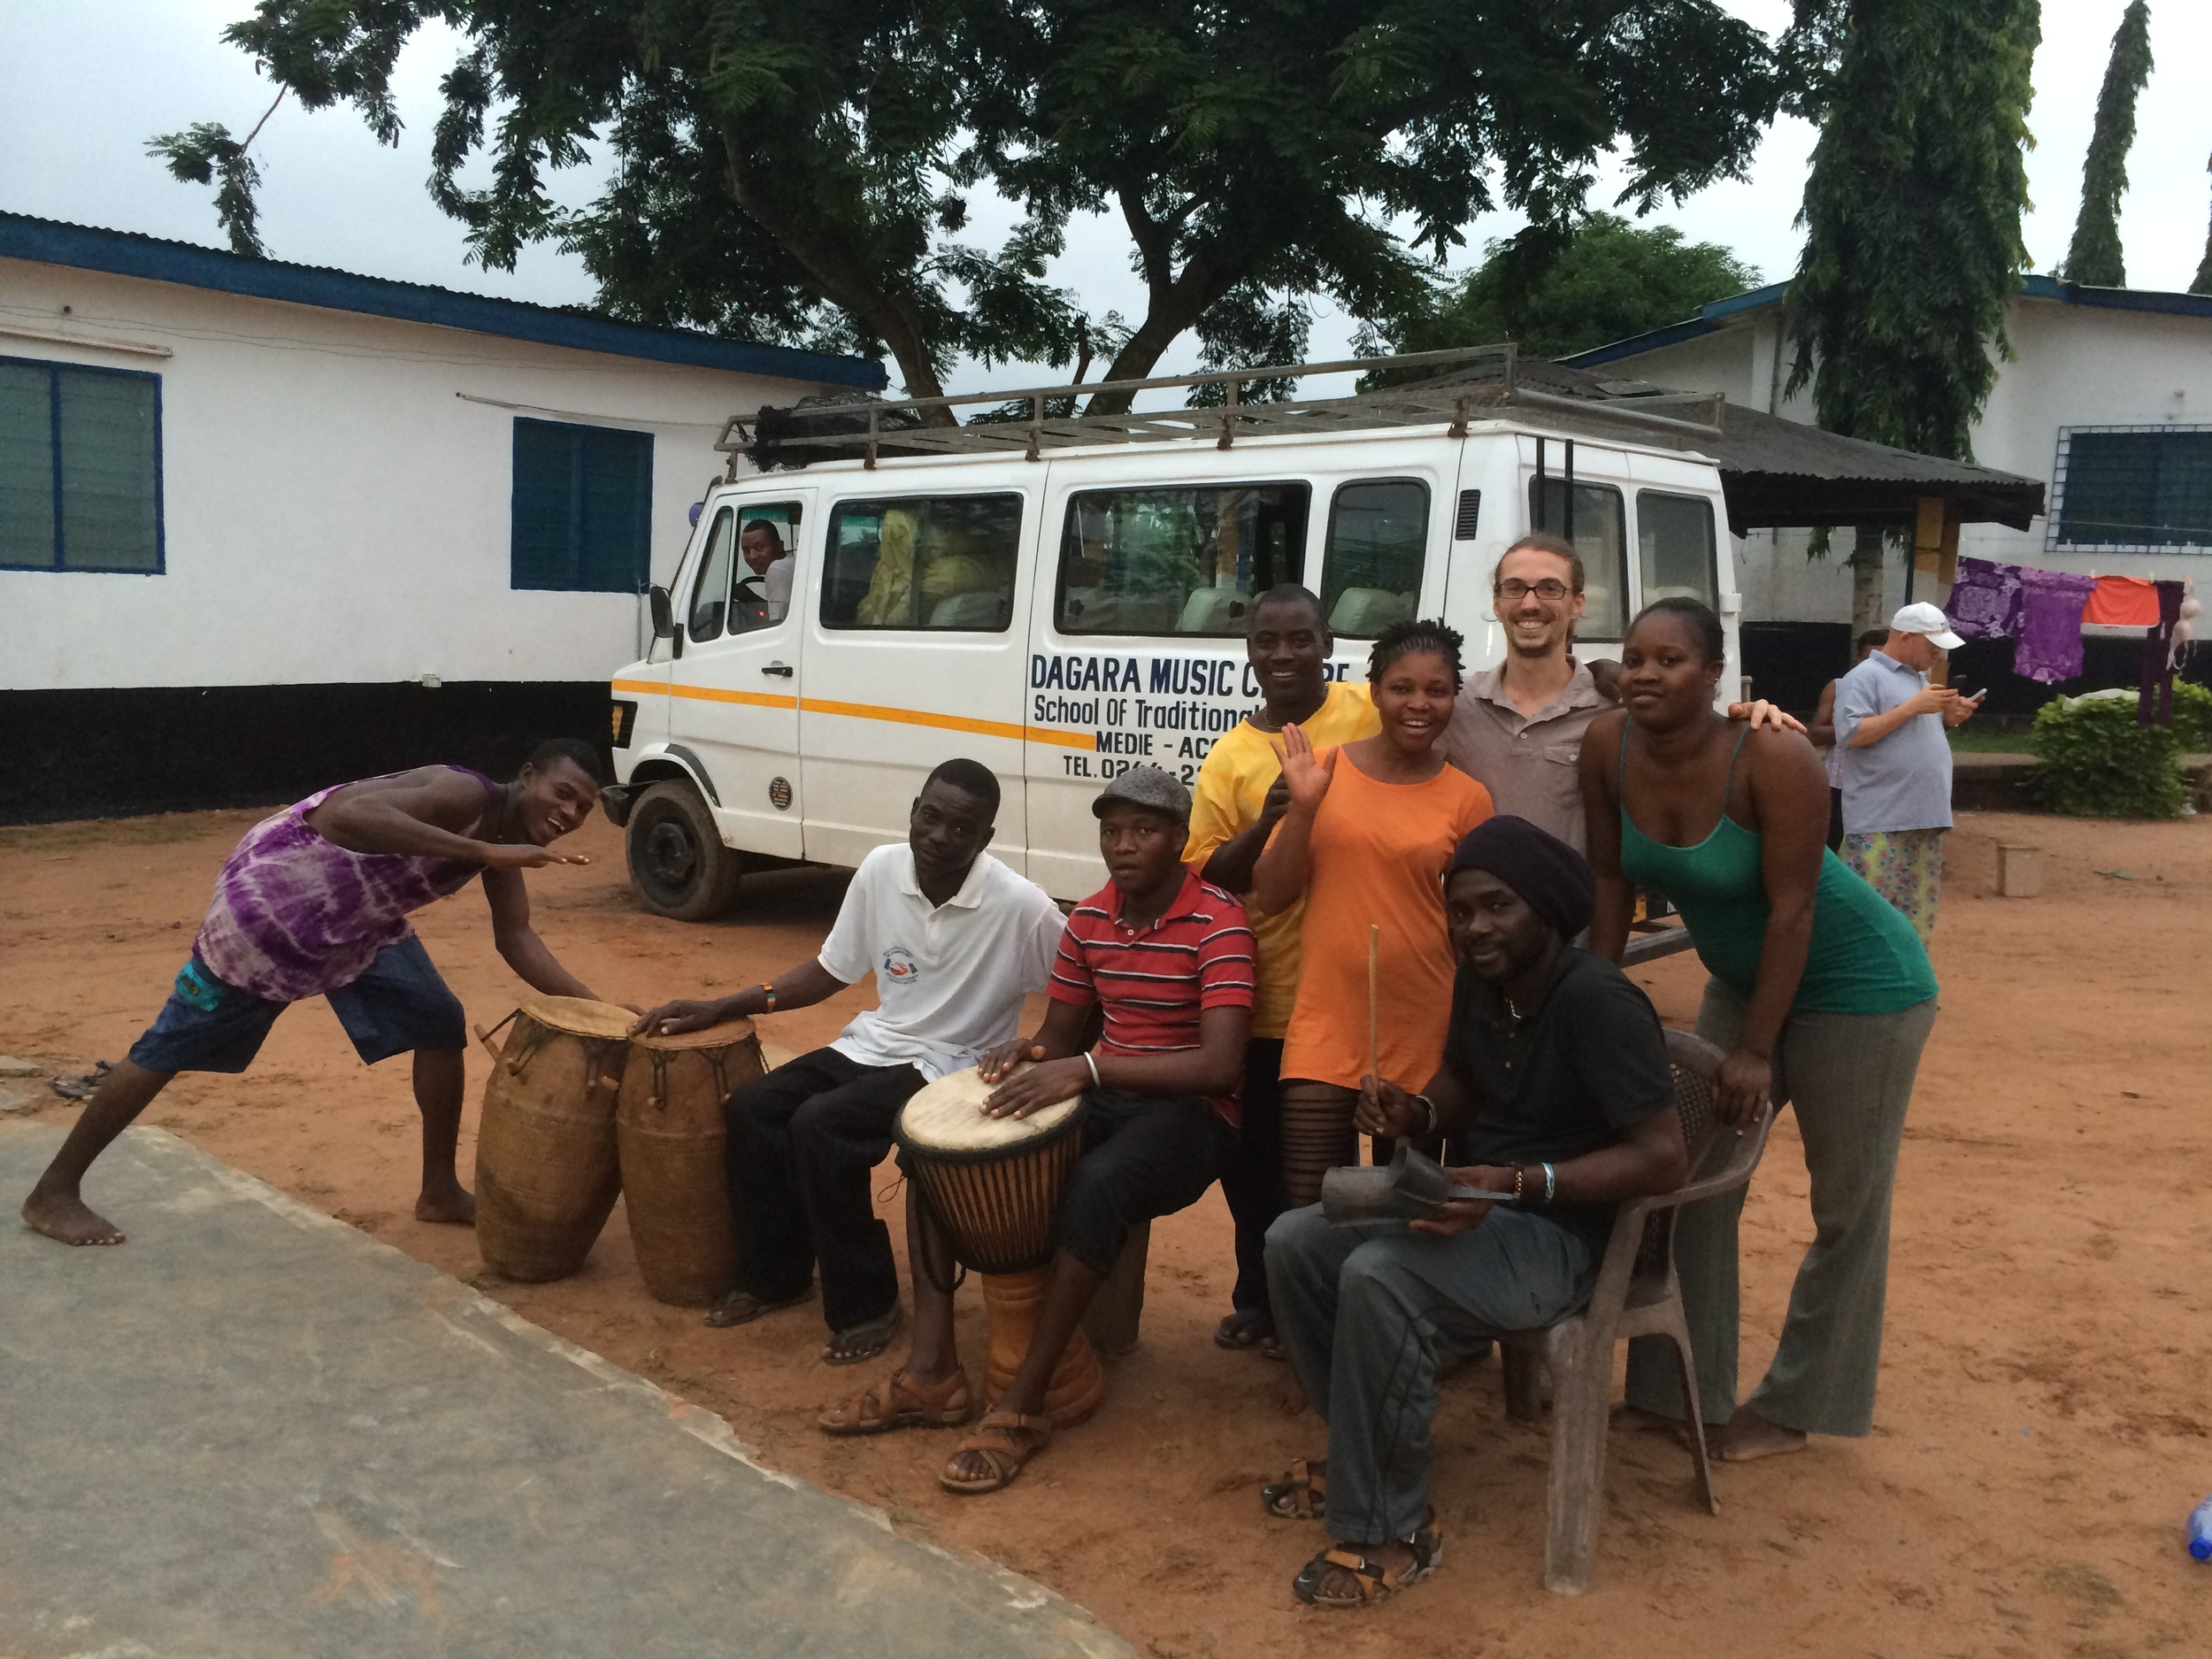 Dan with the staff at the Dagara Music Center, Medie, Ghana, 2014